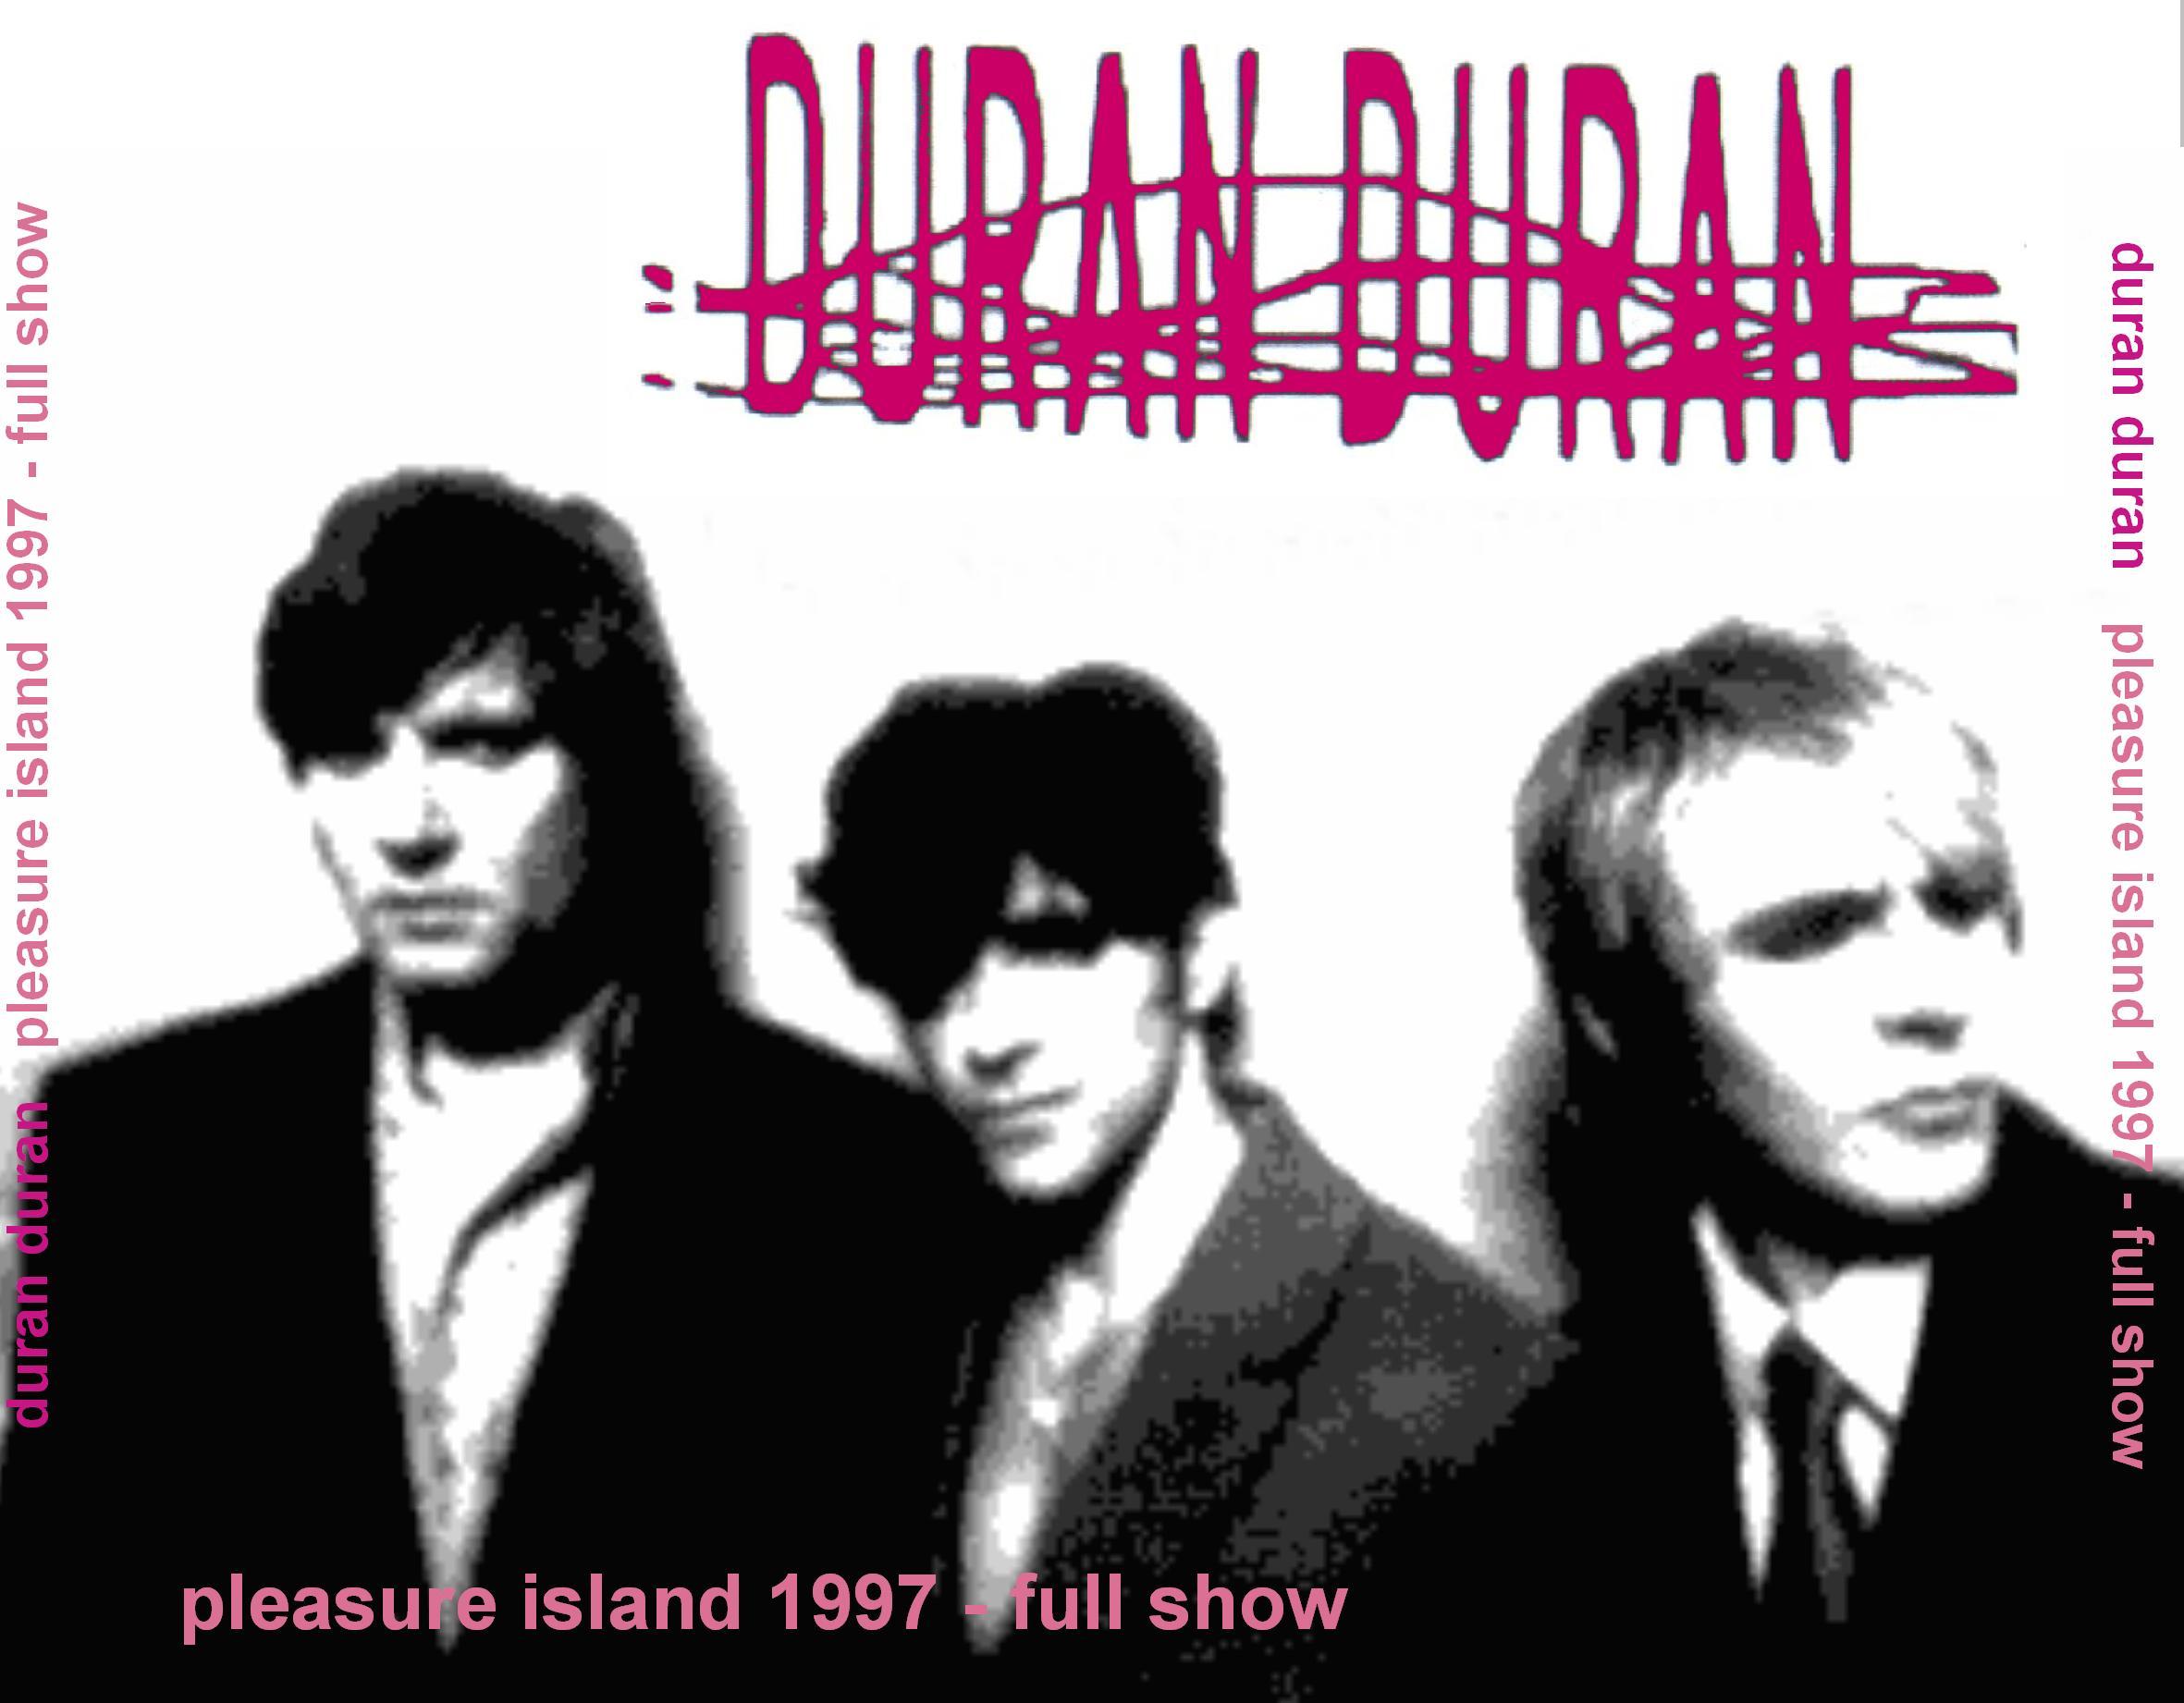 Pleasure Island 1997 Duran Duran Wiki FANDOM